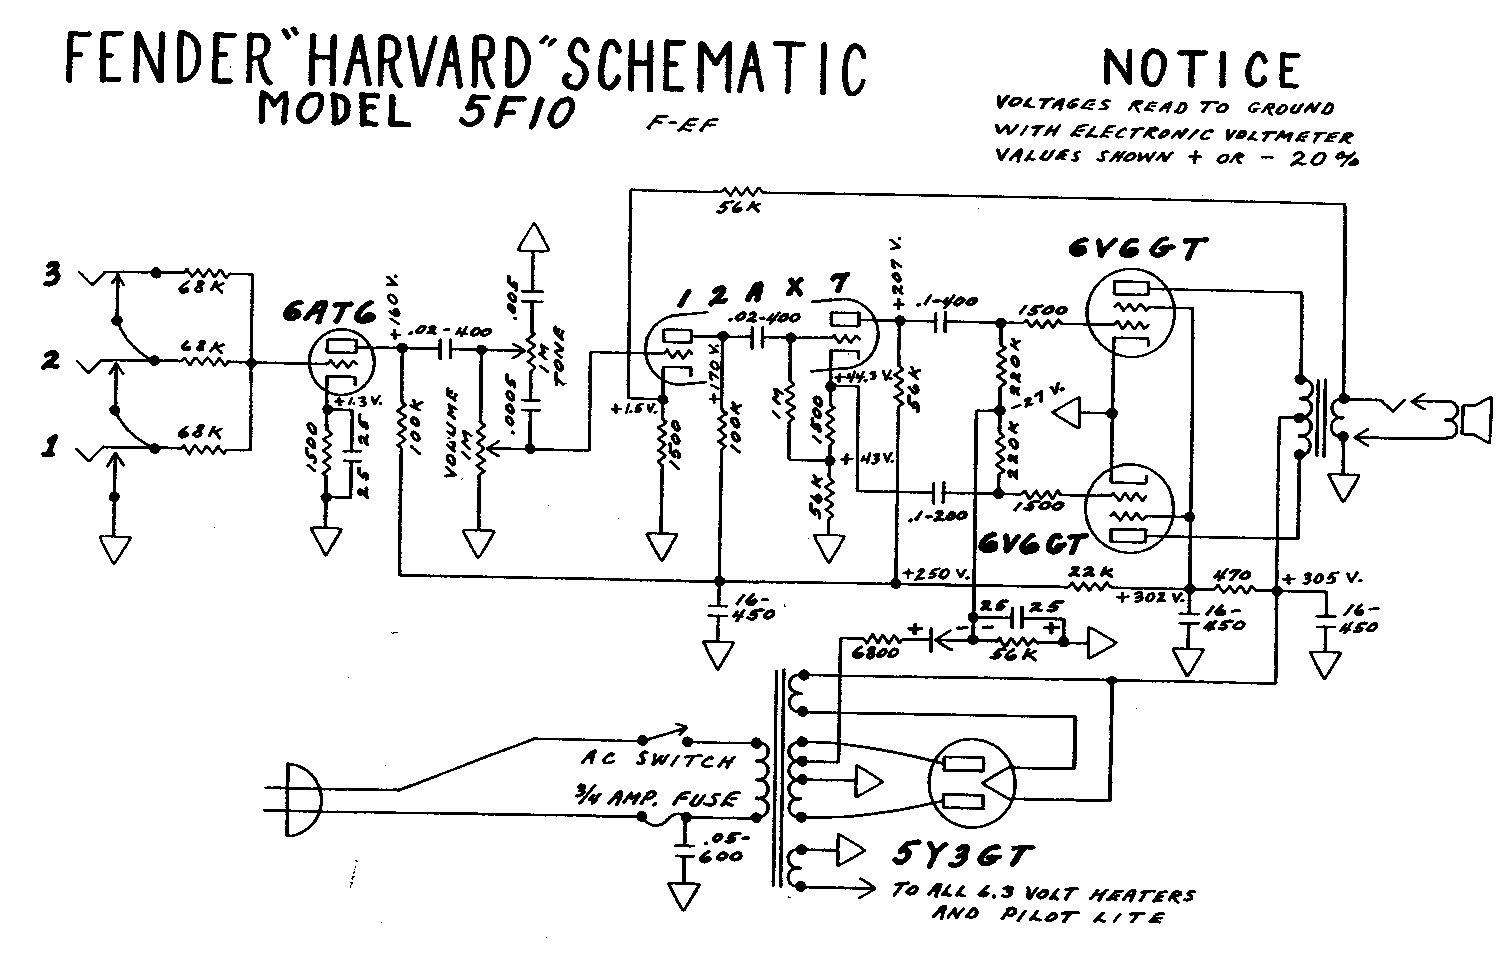 infernal industries harvard 5f10 1955 1961. Black Bedroom Furniture Sets. Home Design Ideas